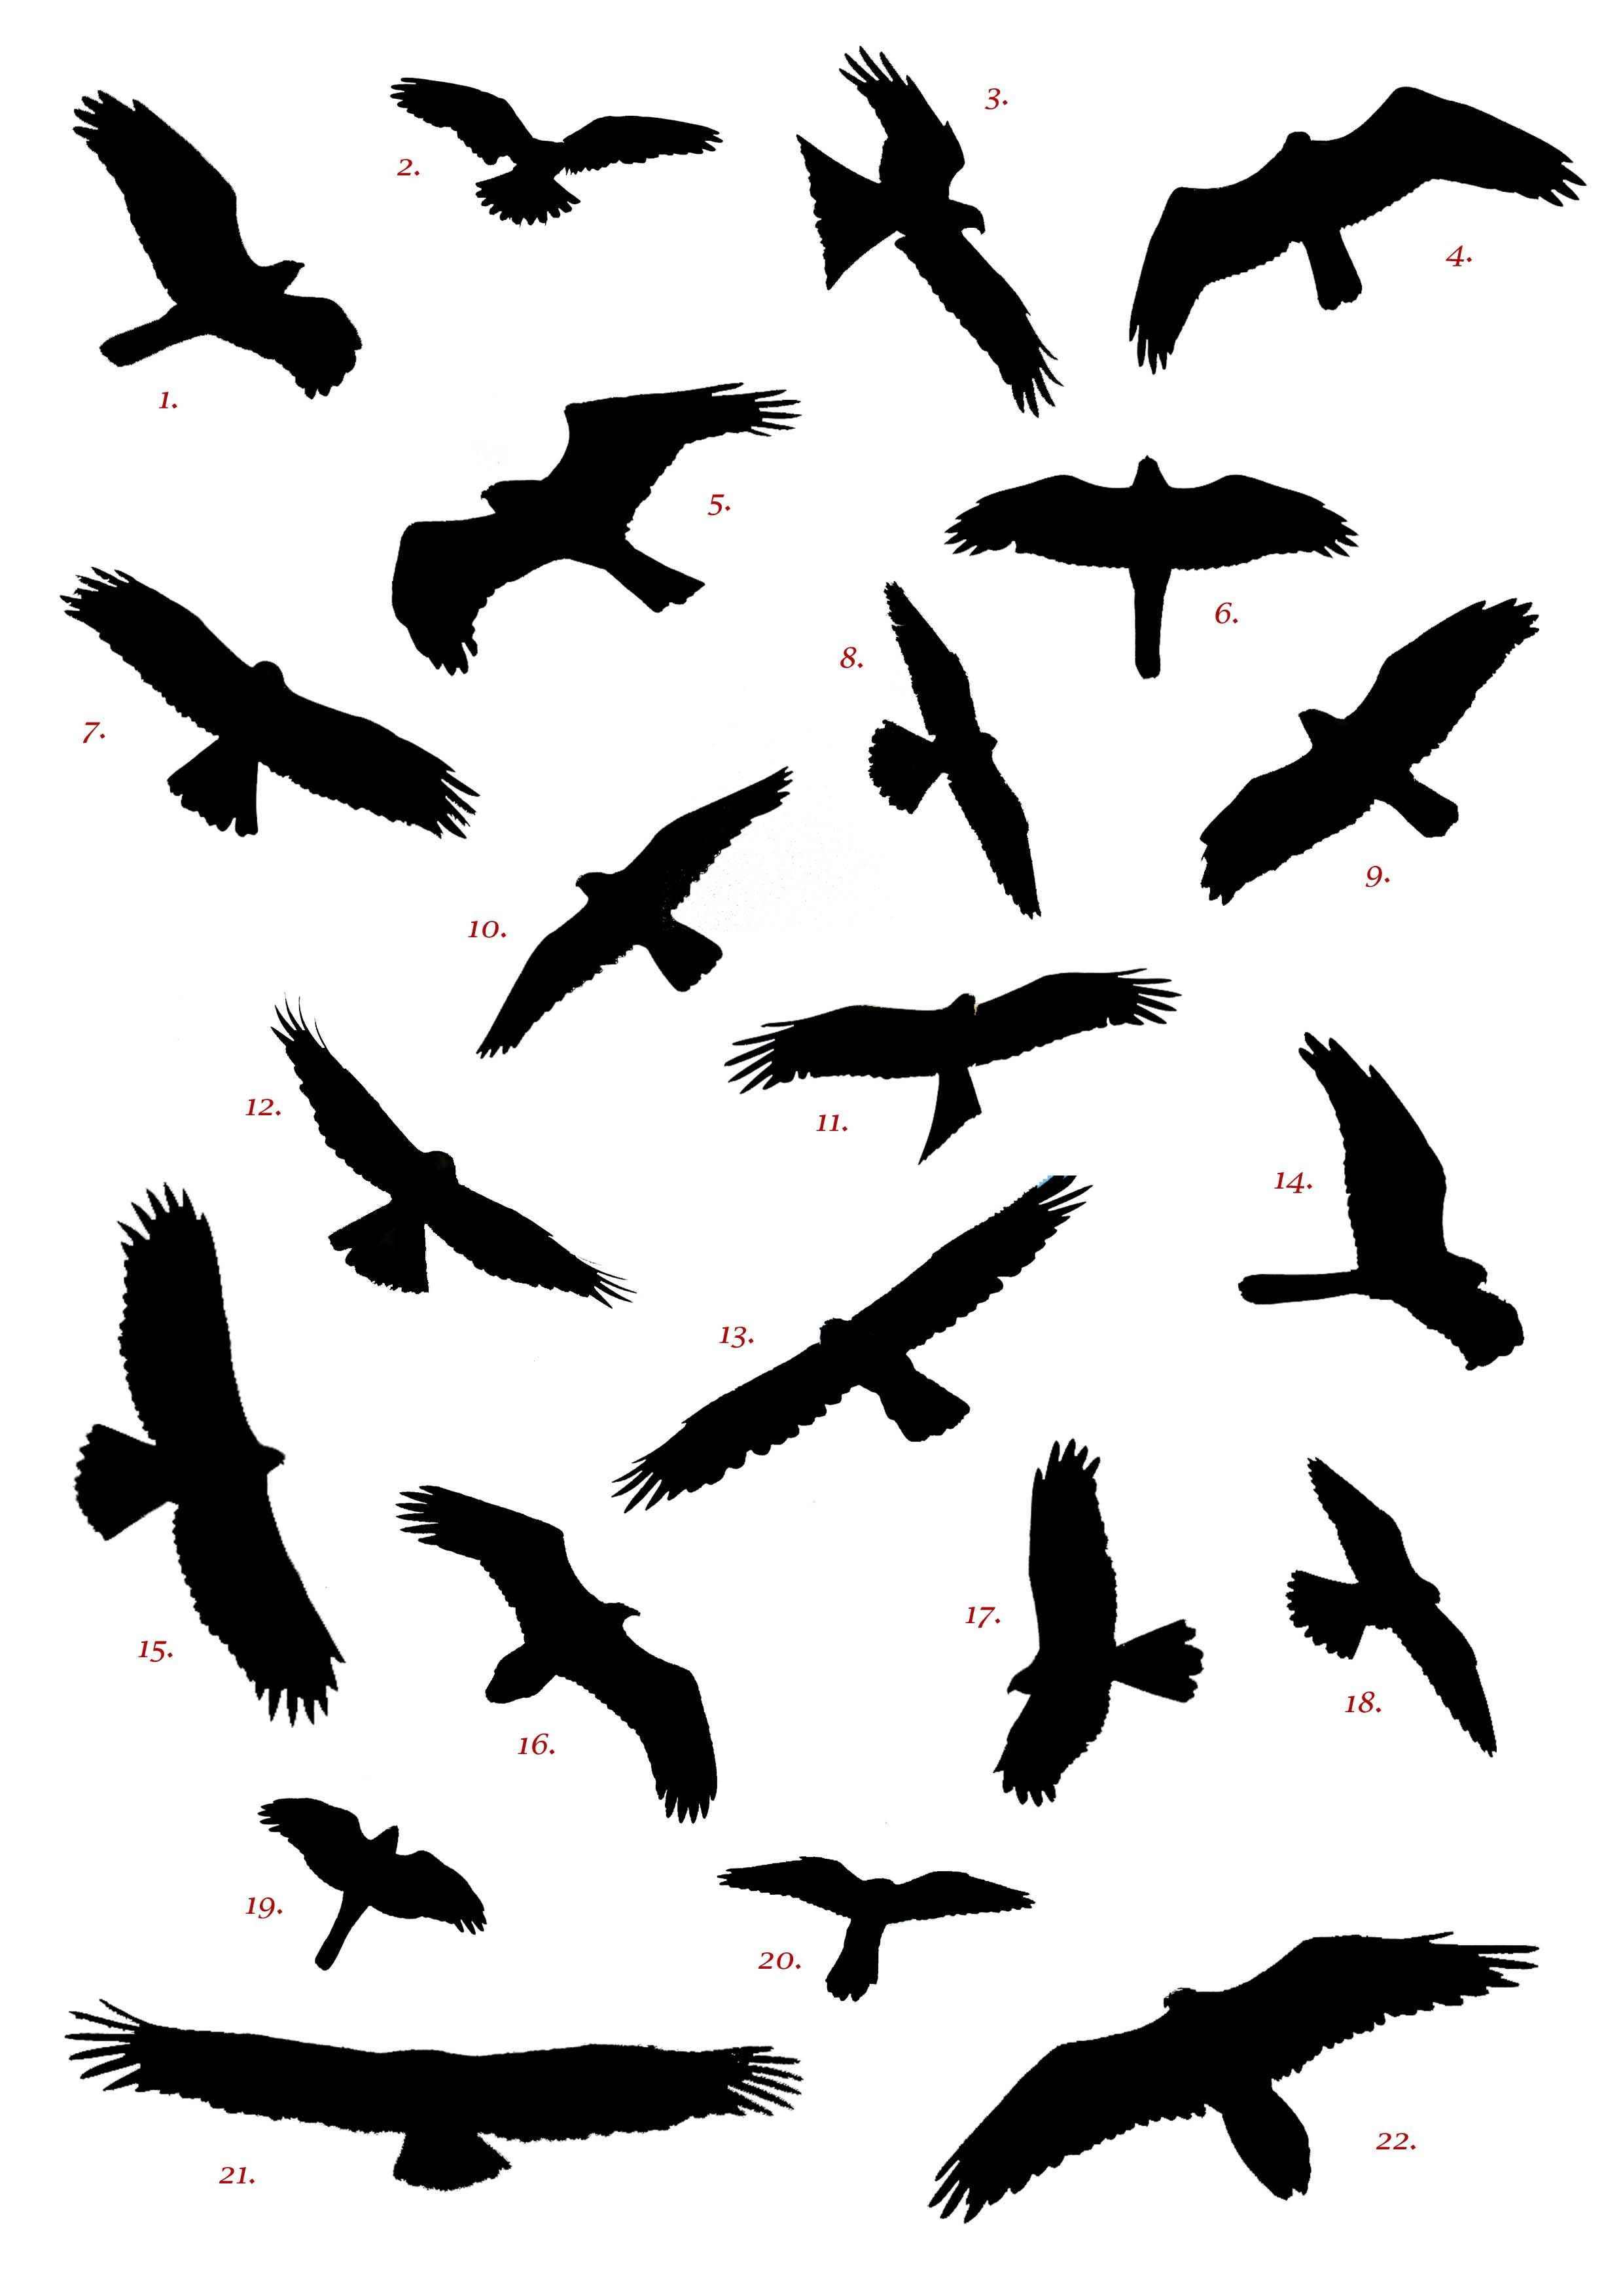 Spanish Raptor Silhouette Competition Birding In Spain Blog